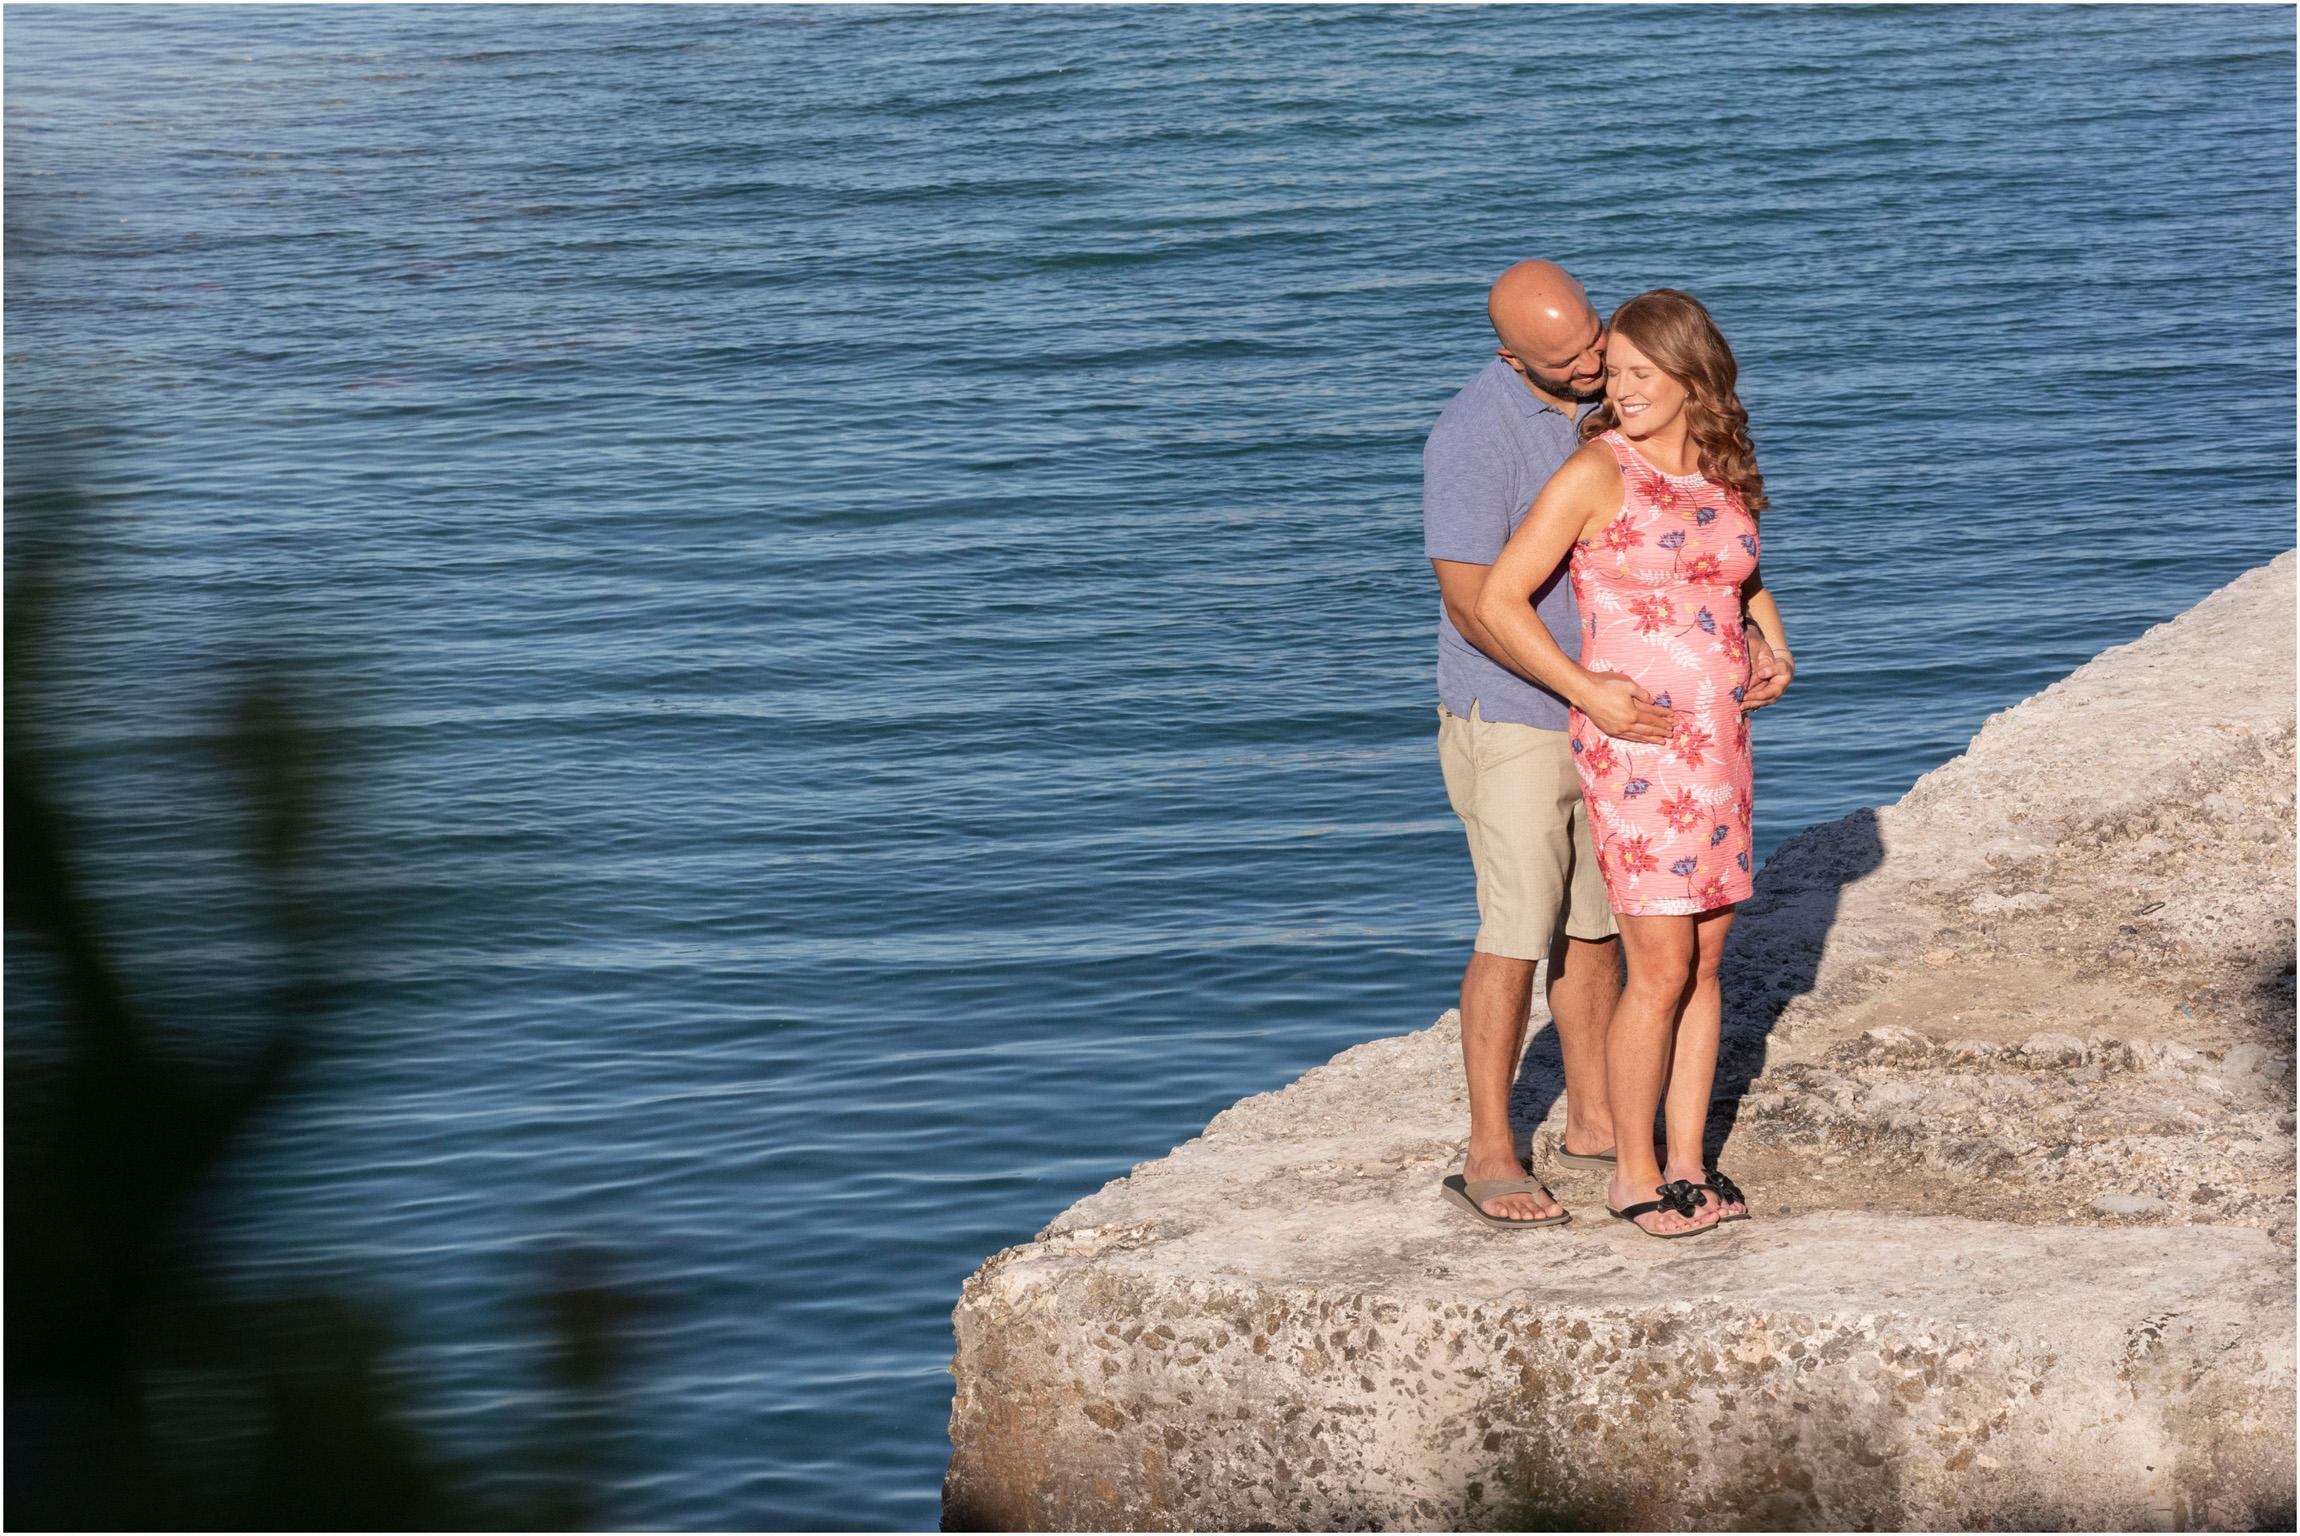 ©FianderFoto_Bermuda Maternity Photographer_Elys Harbour_Ft Scaur_Airbnb_Victoria_Mike_004.jpg